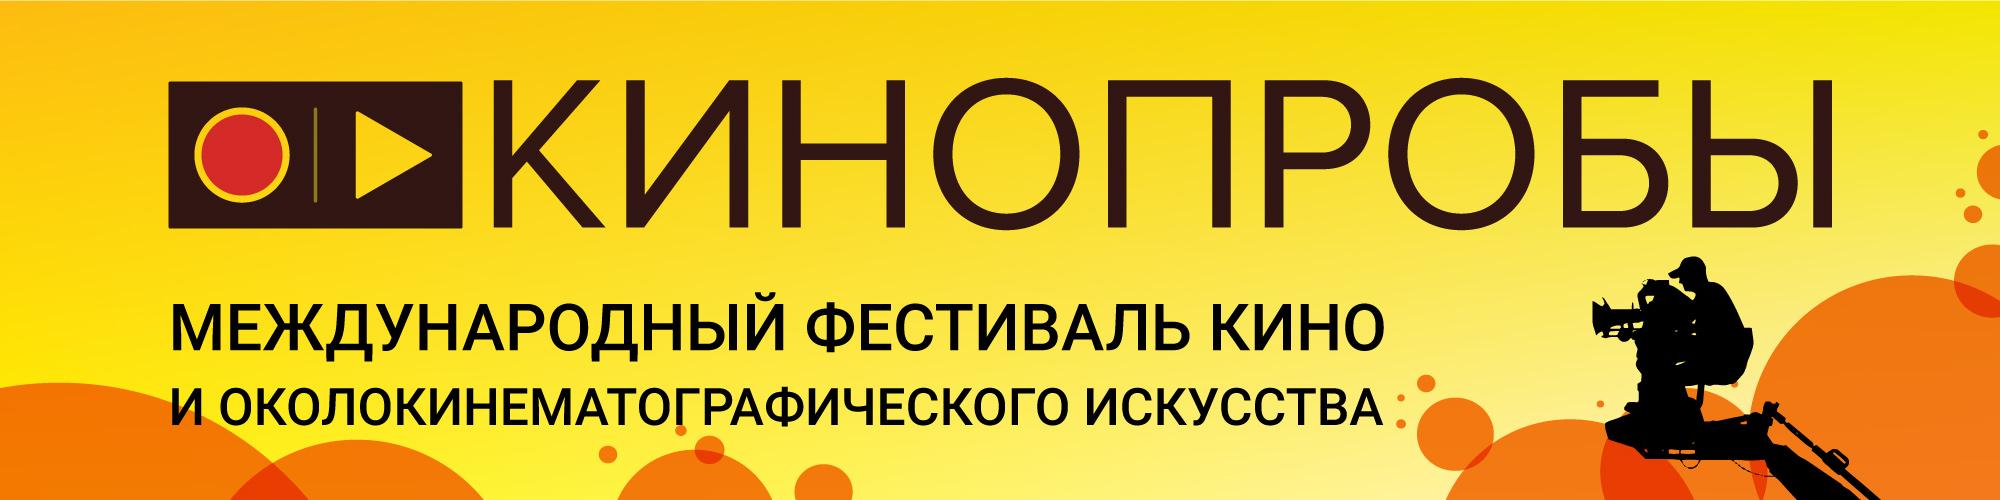 Kinoproby-e-Banner2000x500